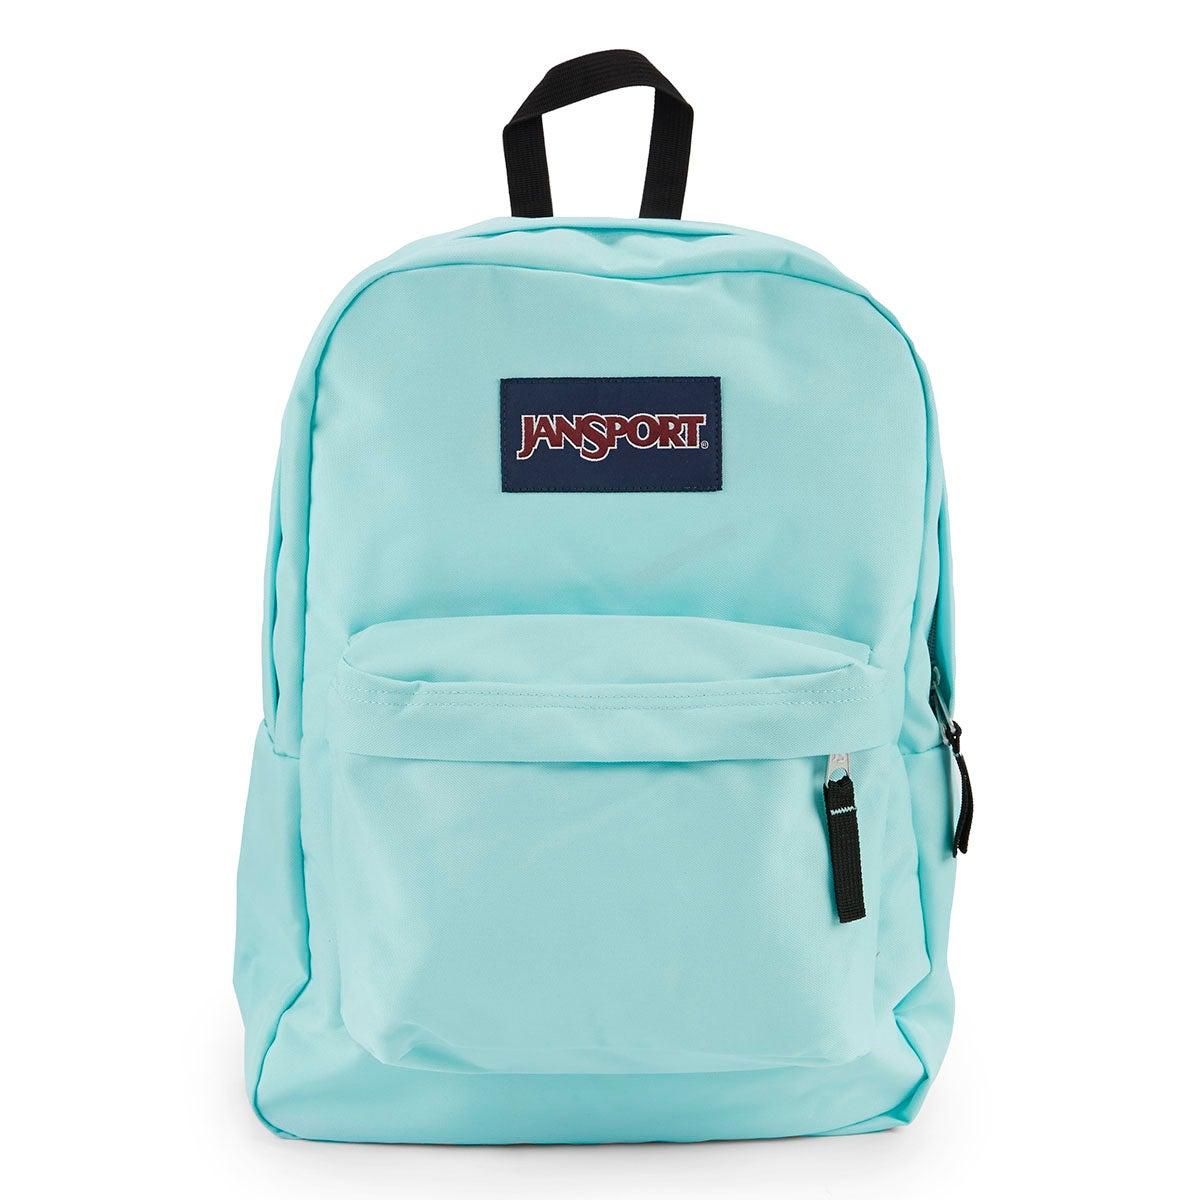 Lds Jansport Superbreak aqua backpack